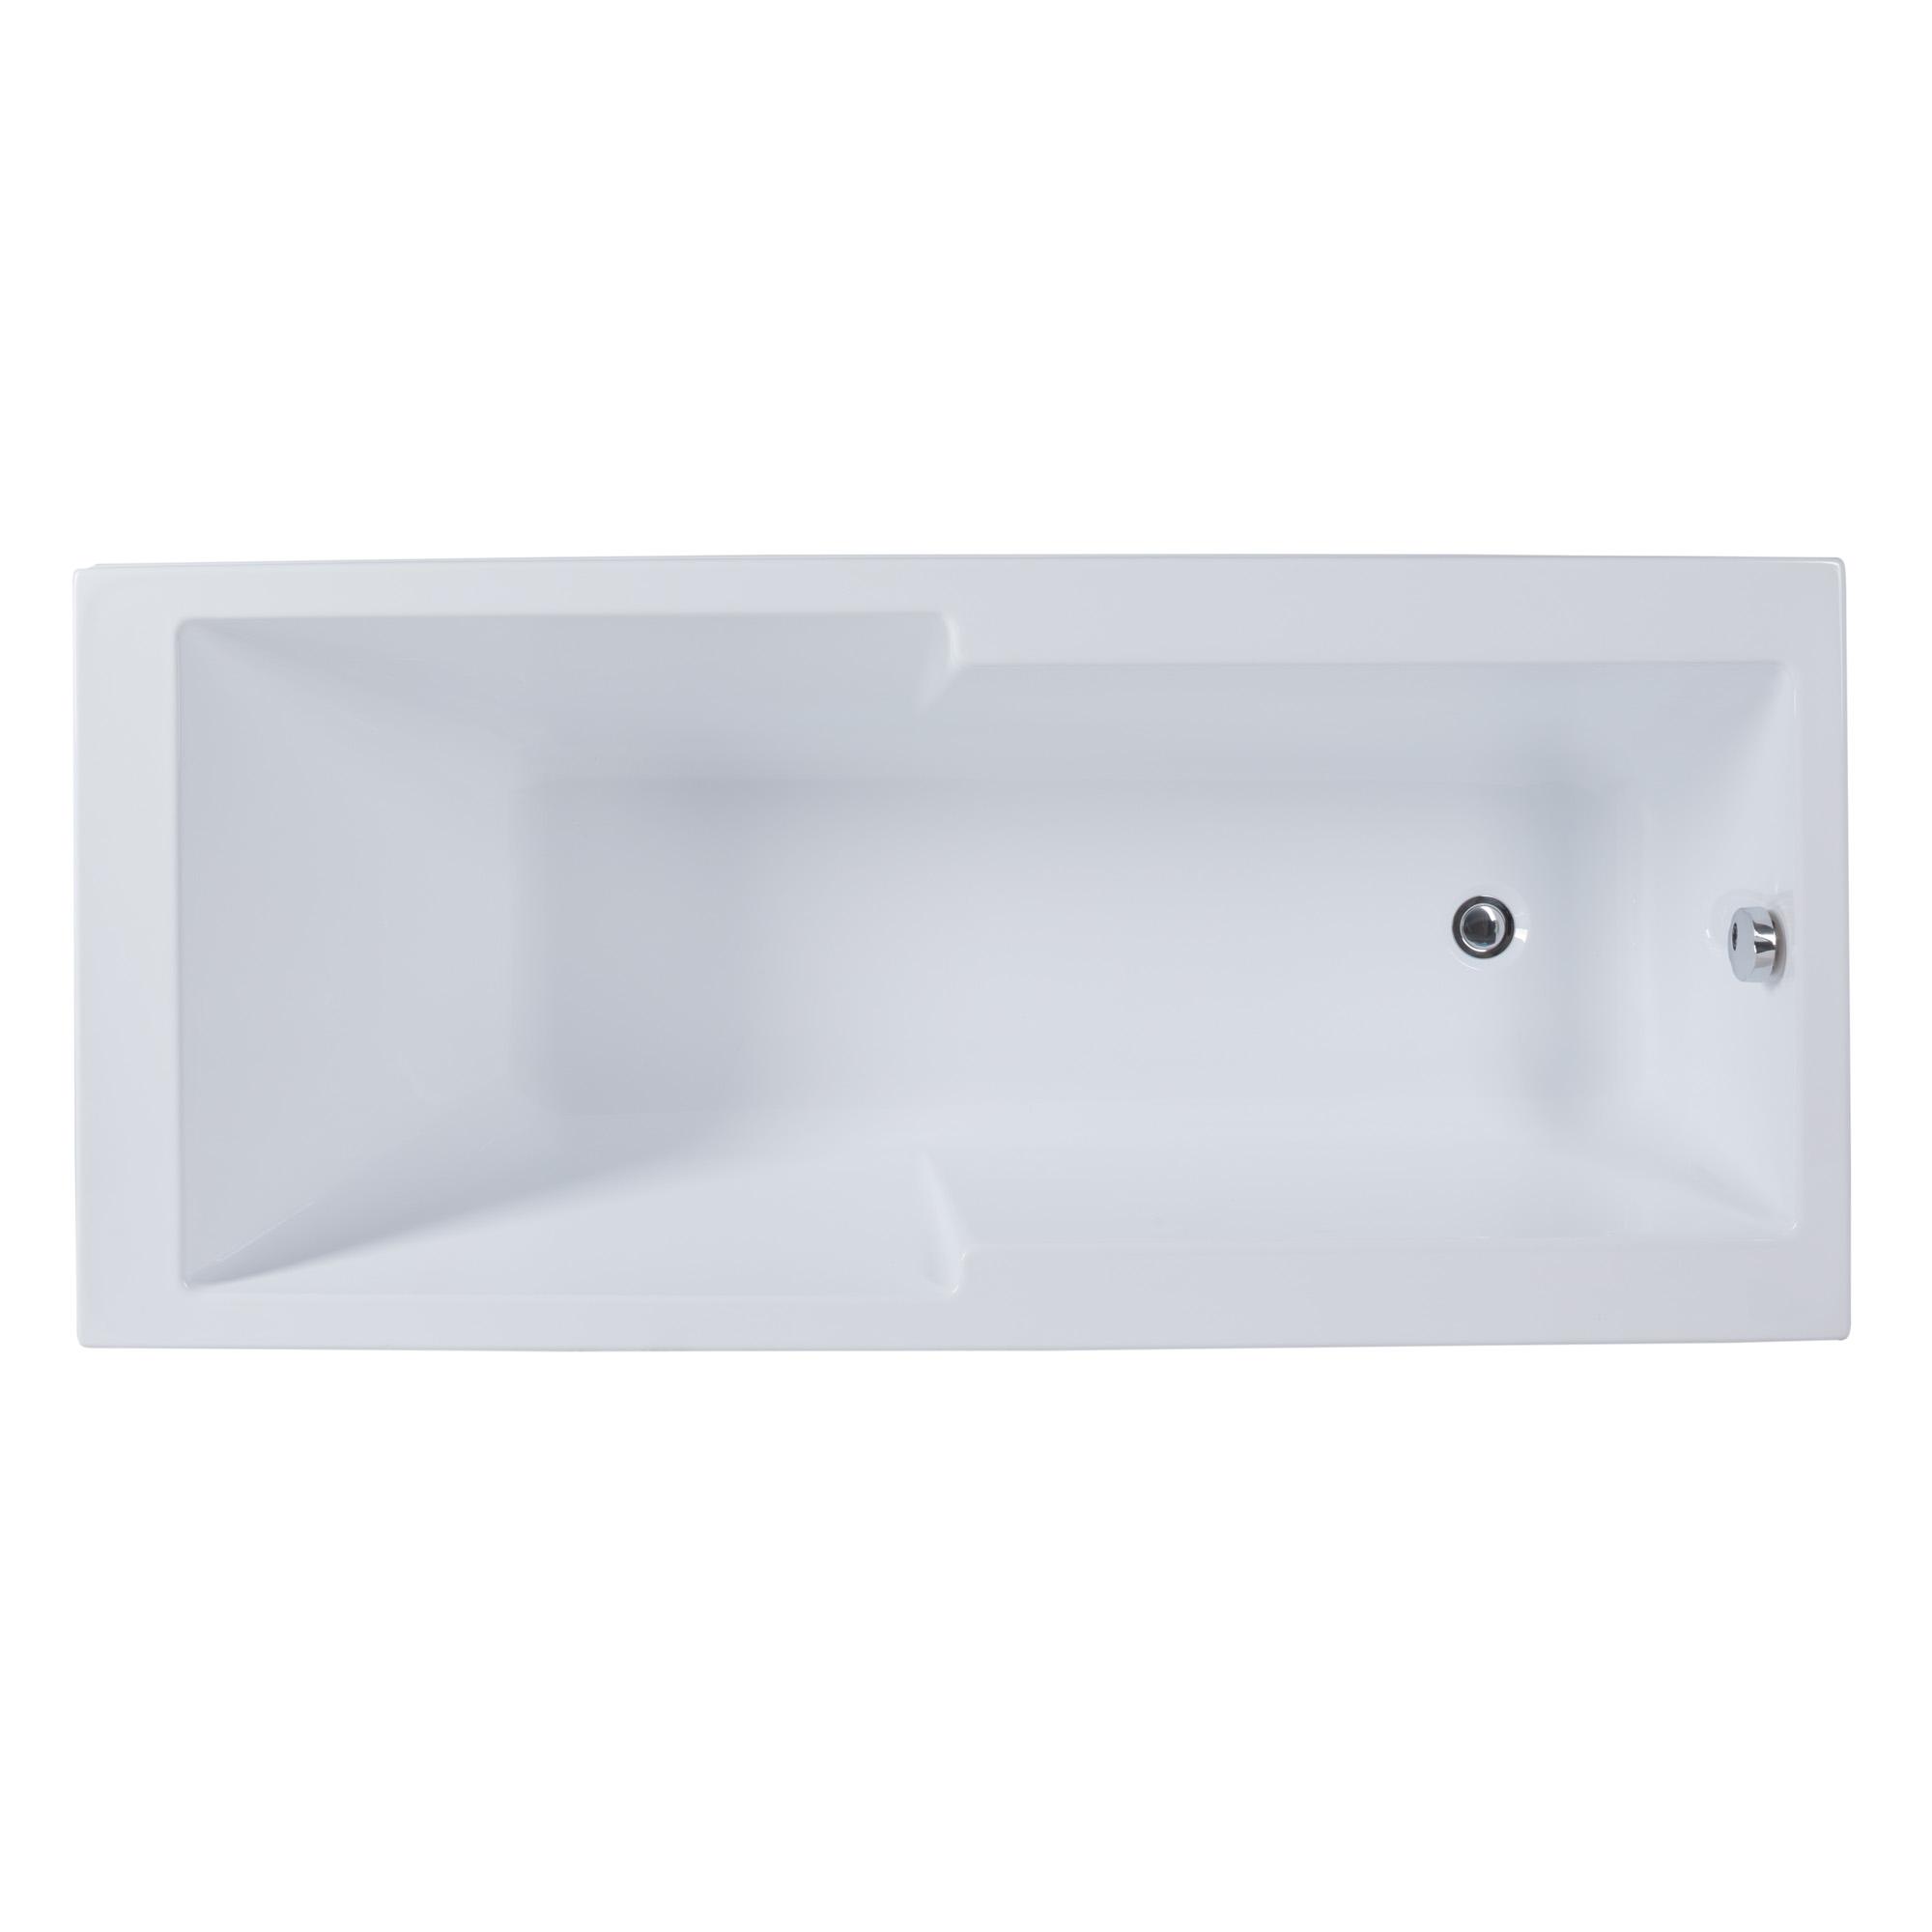 Акриловая ванна Aquanet Taurus 170x75 без гидромассажа цена